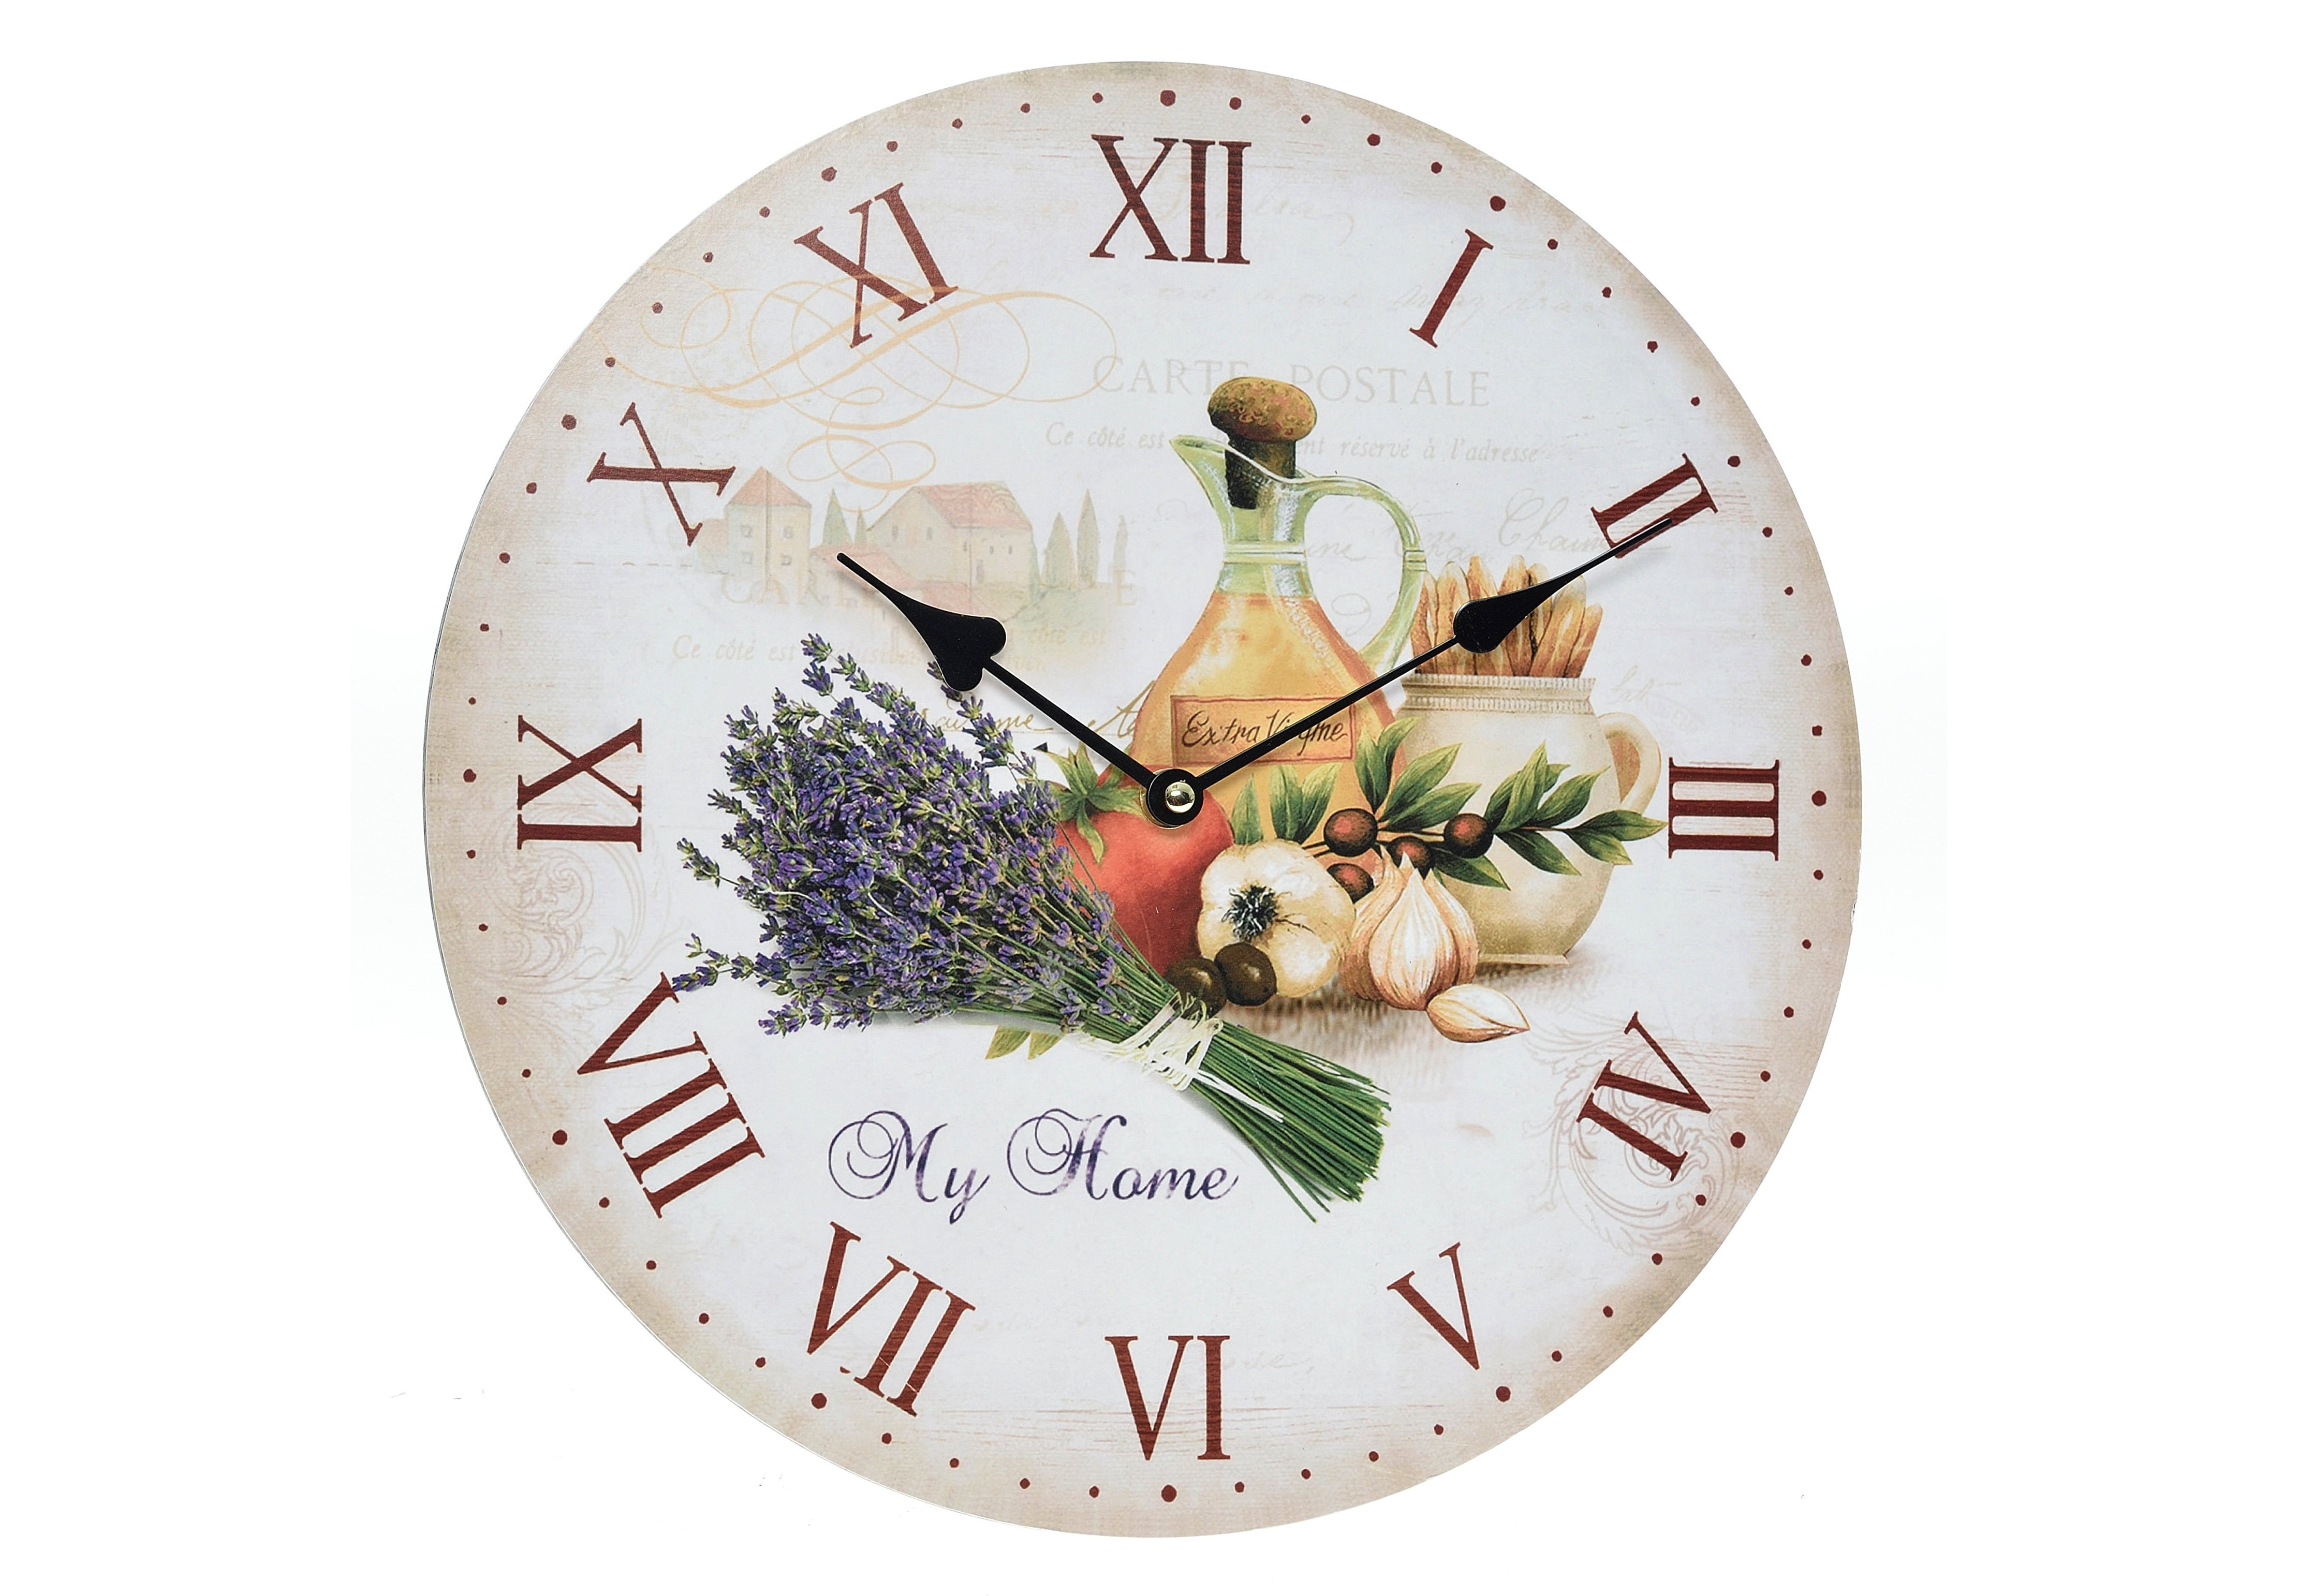 Часы настенные VertaНастенные часы<br>Кварцевый механизм.<br><br>Material: Дерево<br>Width см: None<br>Depth см: 4<br>Height см: None<br>Diameter см: 34